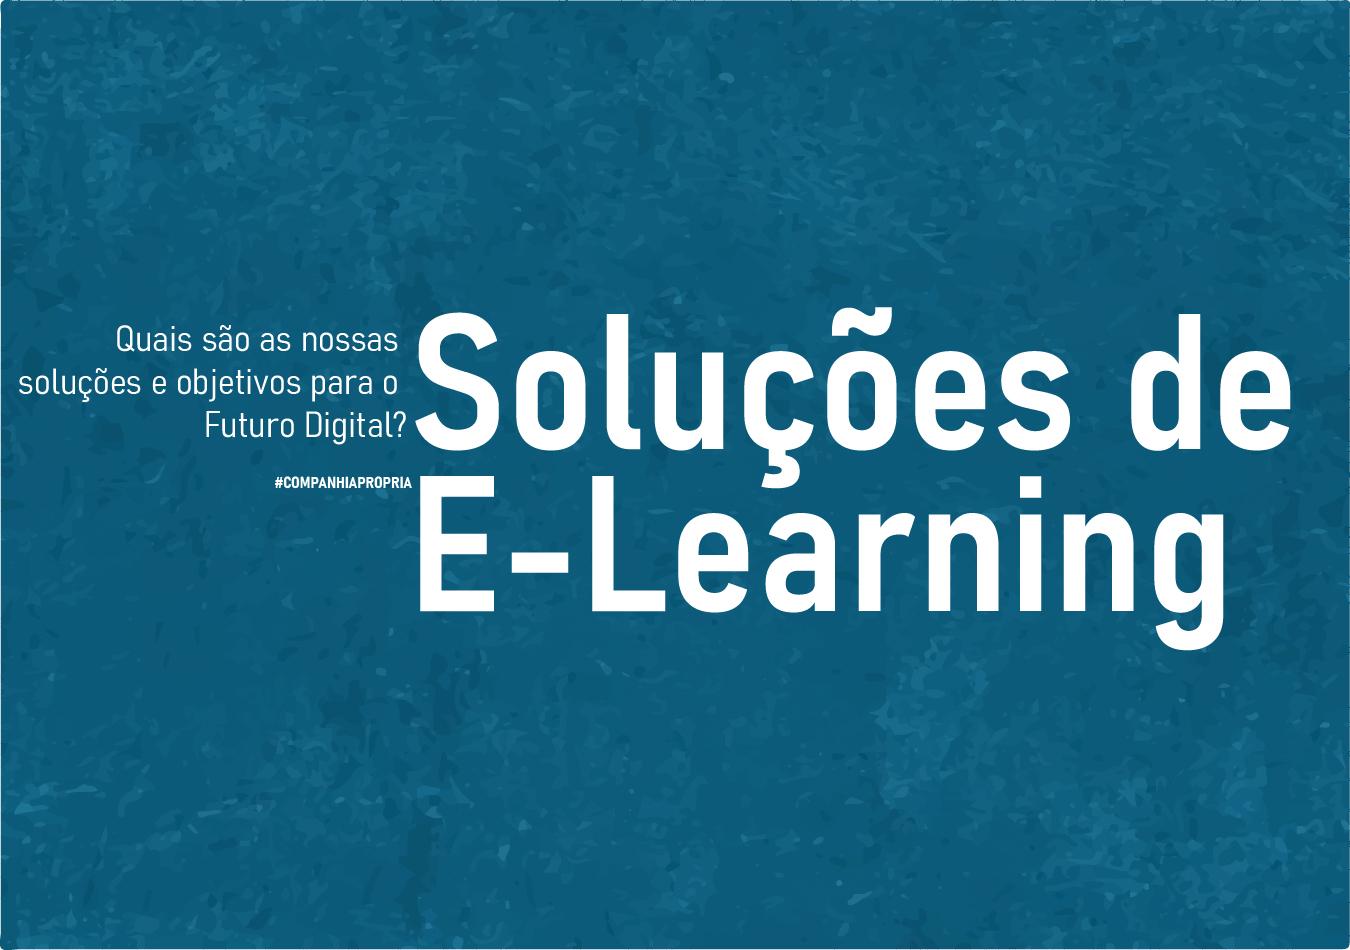 soluções de e-learning